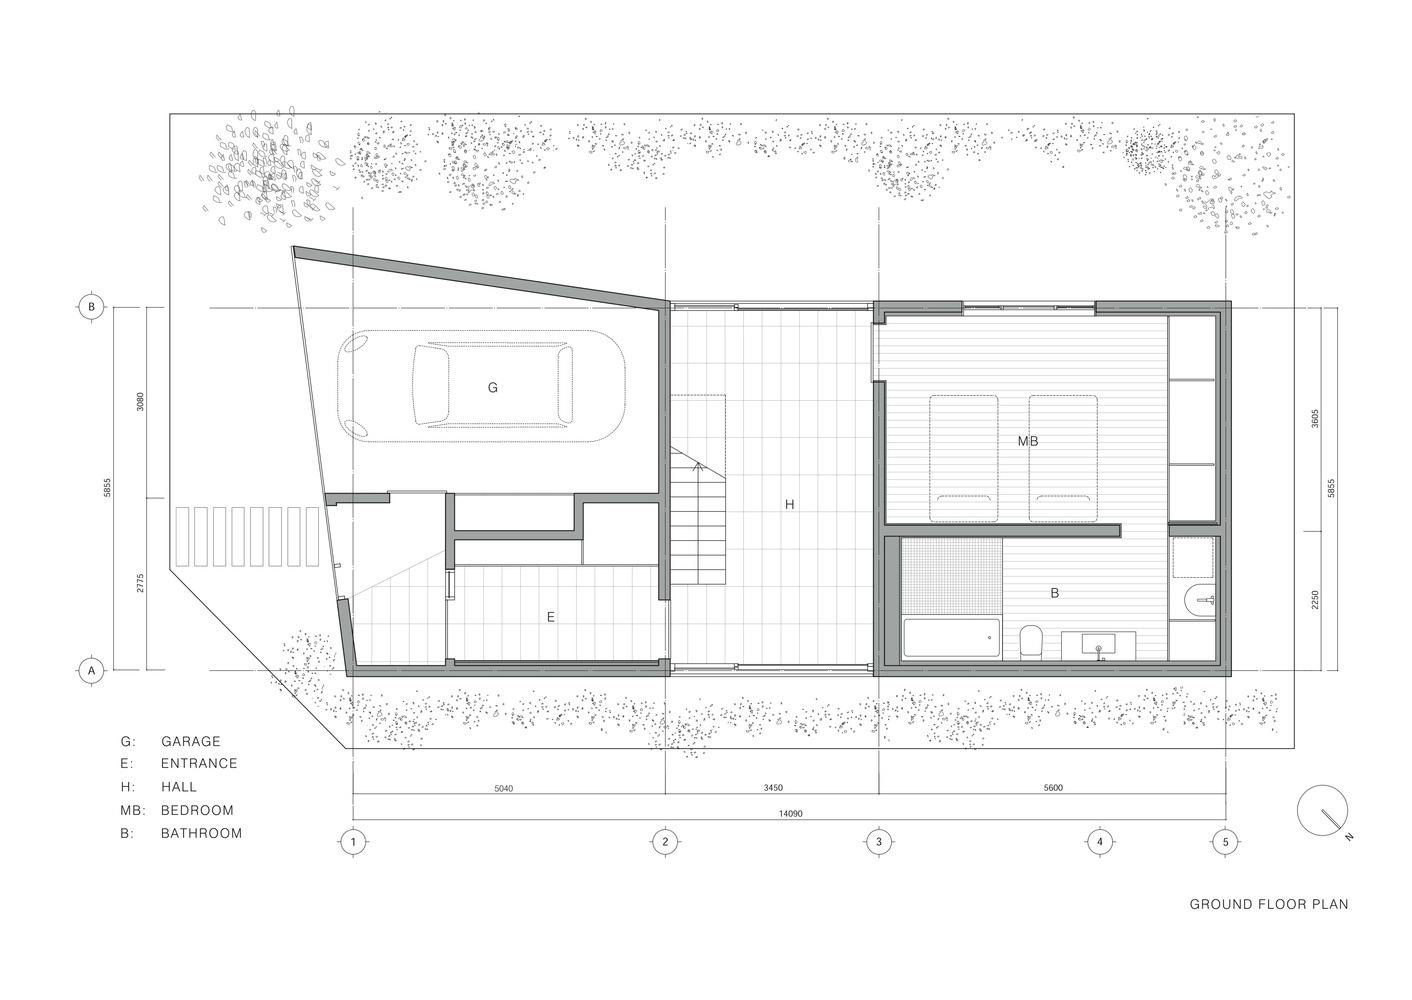 Good U House,Ground Floor Plan